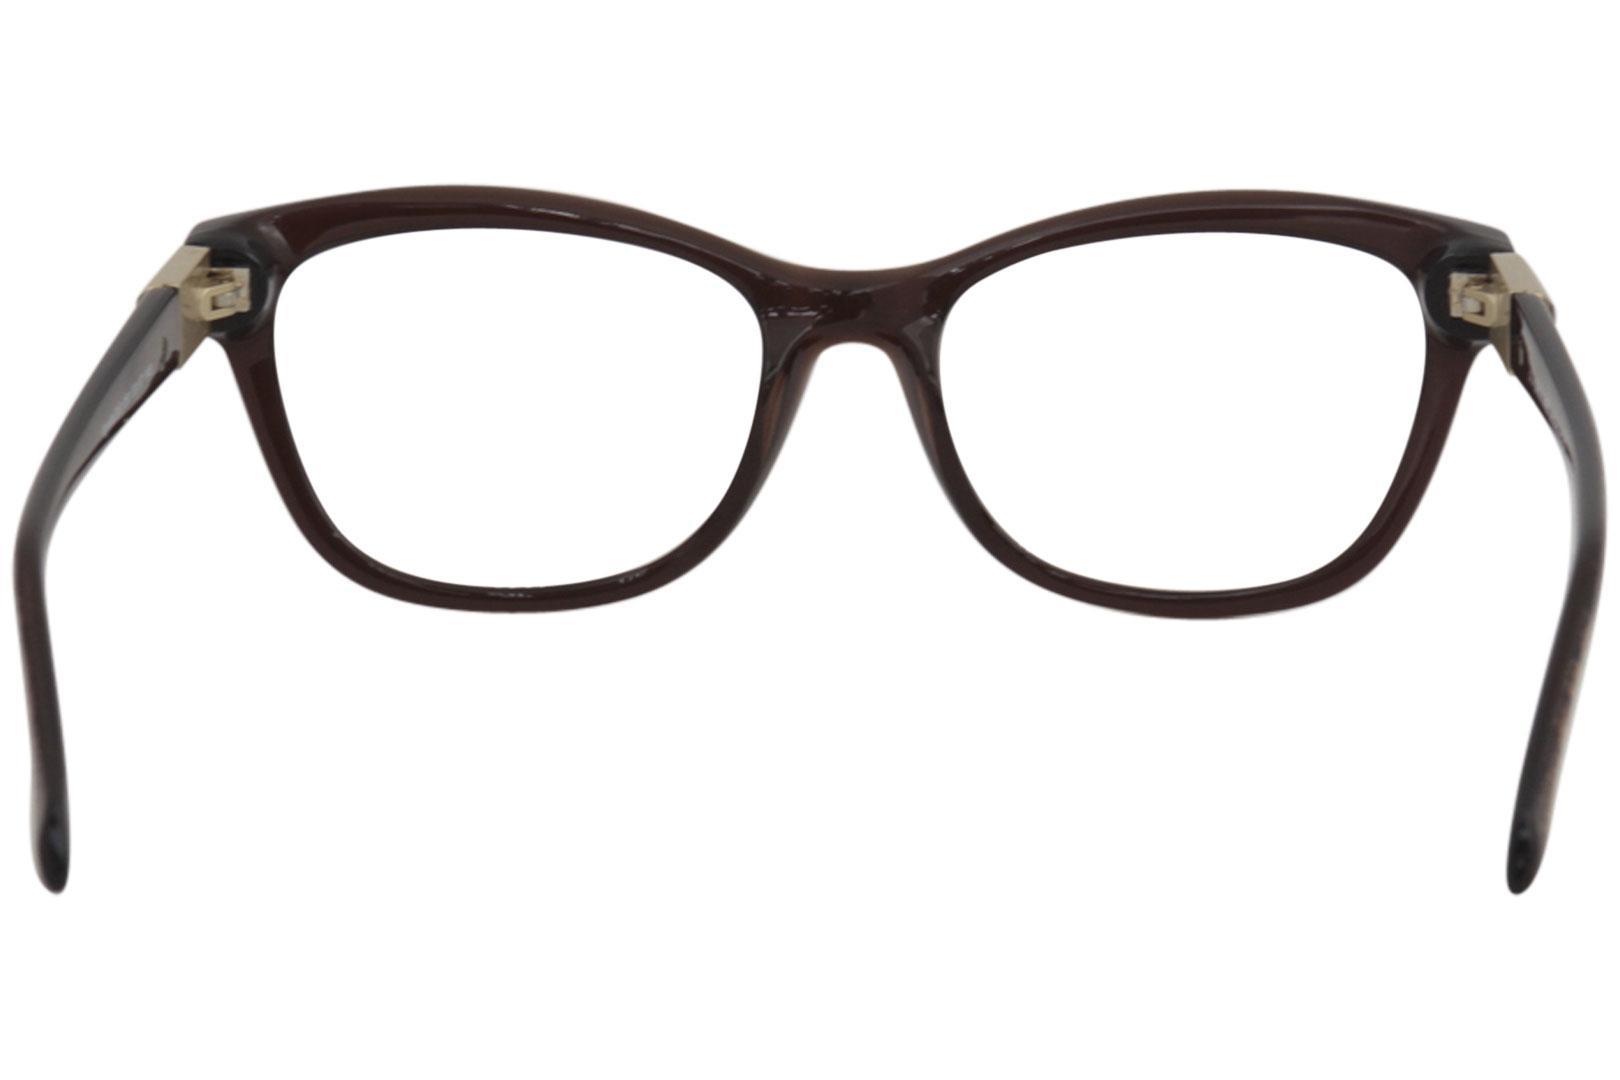 7e8b06fb42e Roberto Cavalli Women s Eyeglasses Algorab 810 Full Rim Optical Frame by Roberto  Cavalli. 12345